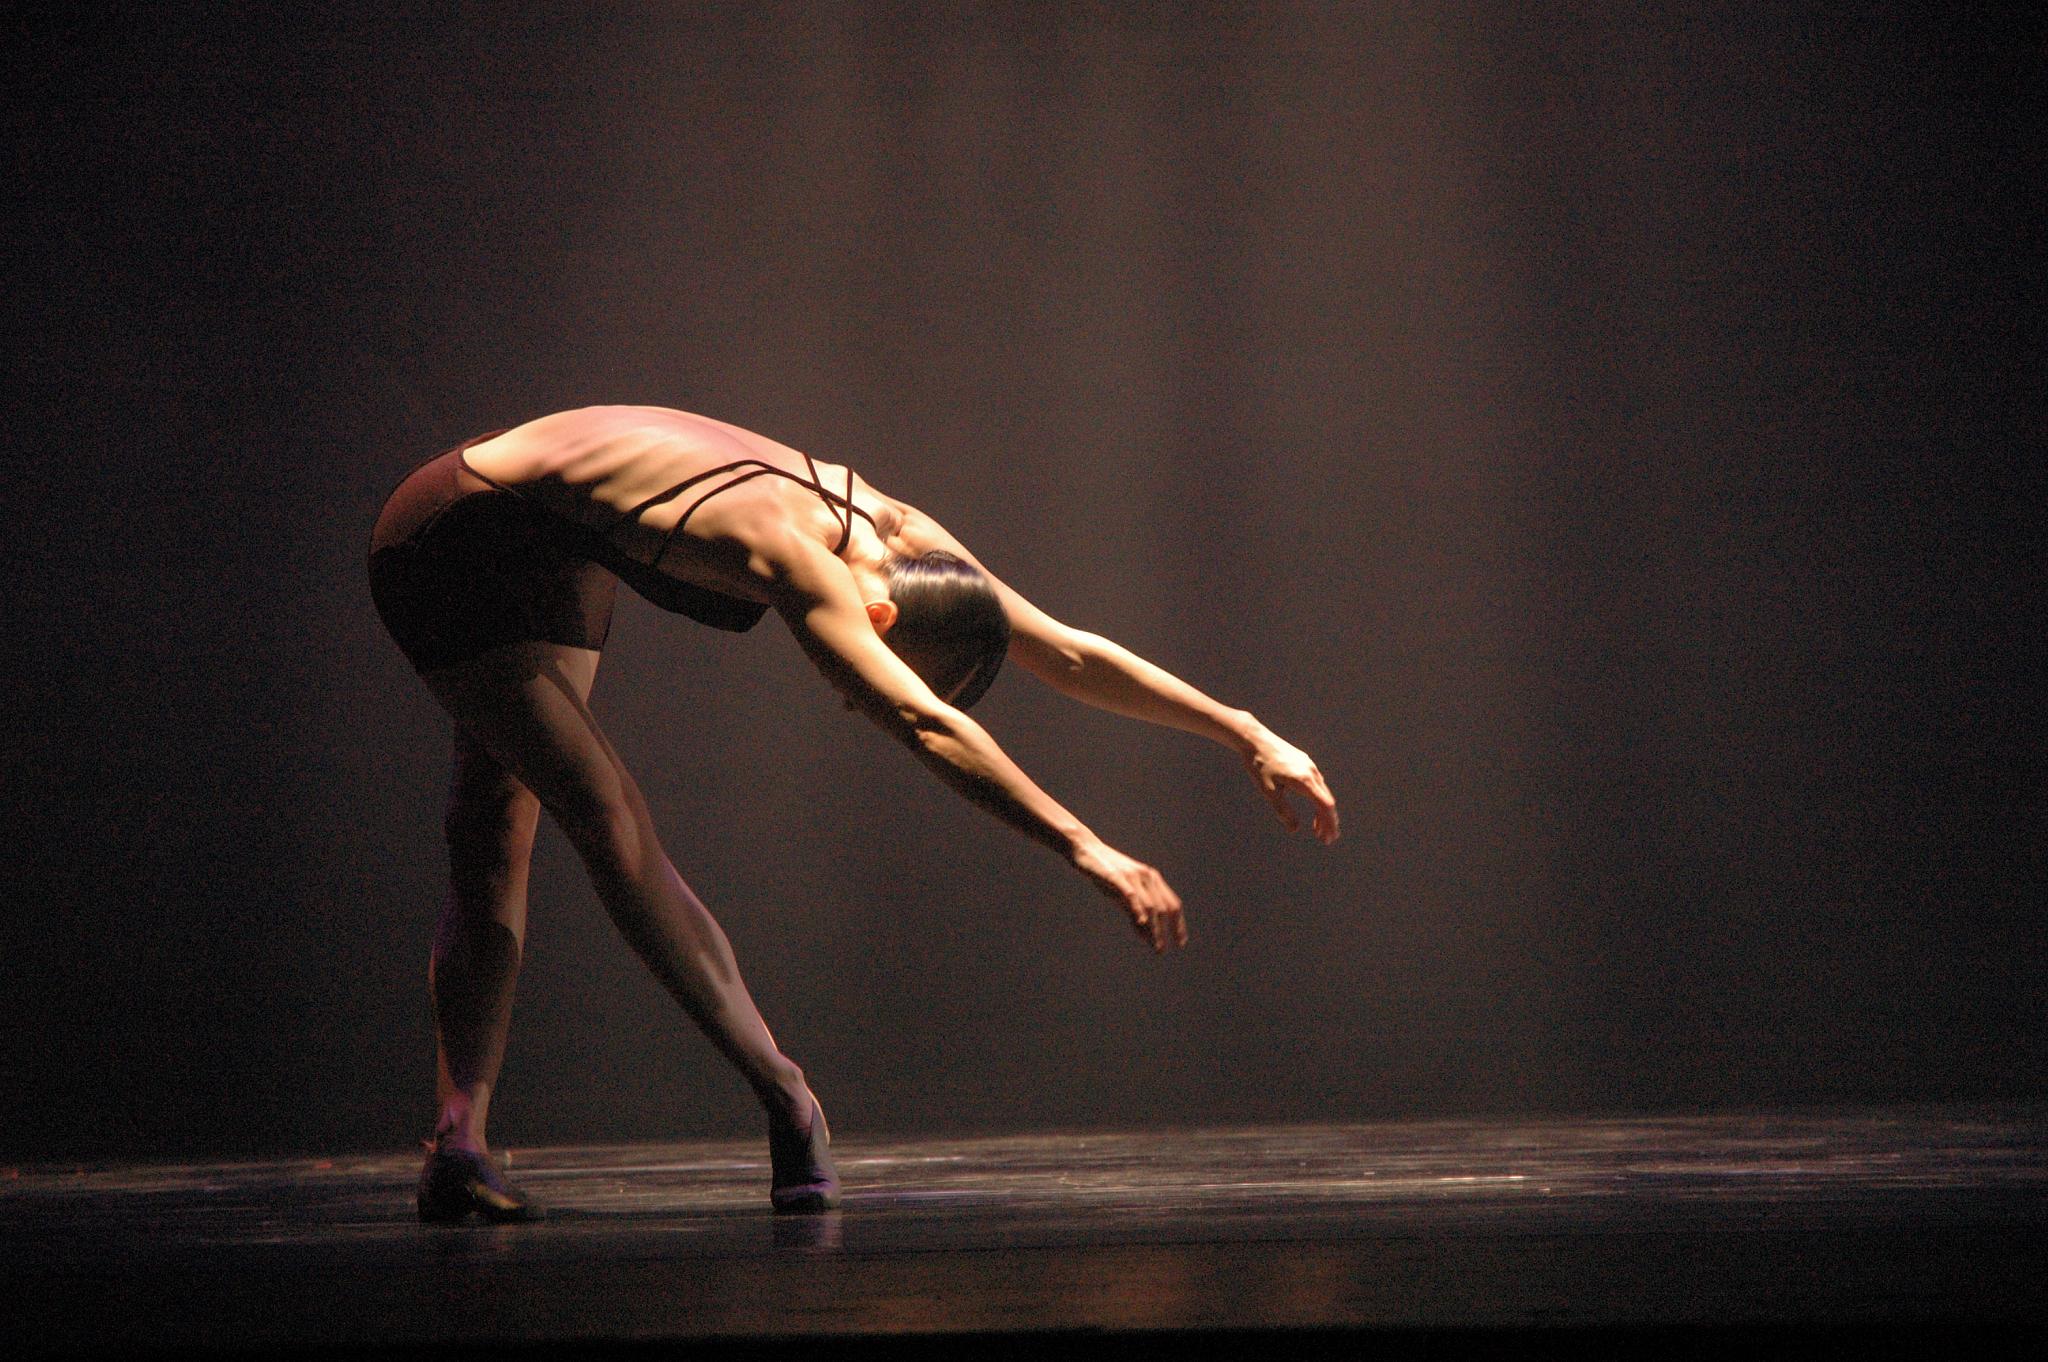 Contemporary Dancer Wallpaper Contemporary dance company Images 2048x1362